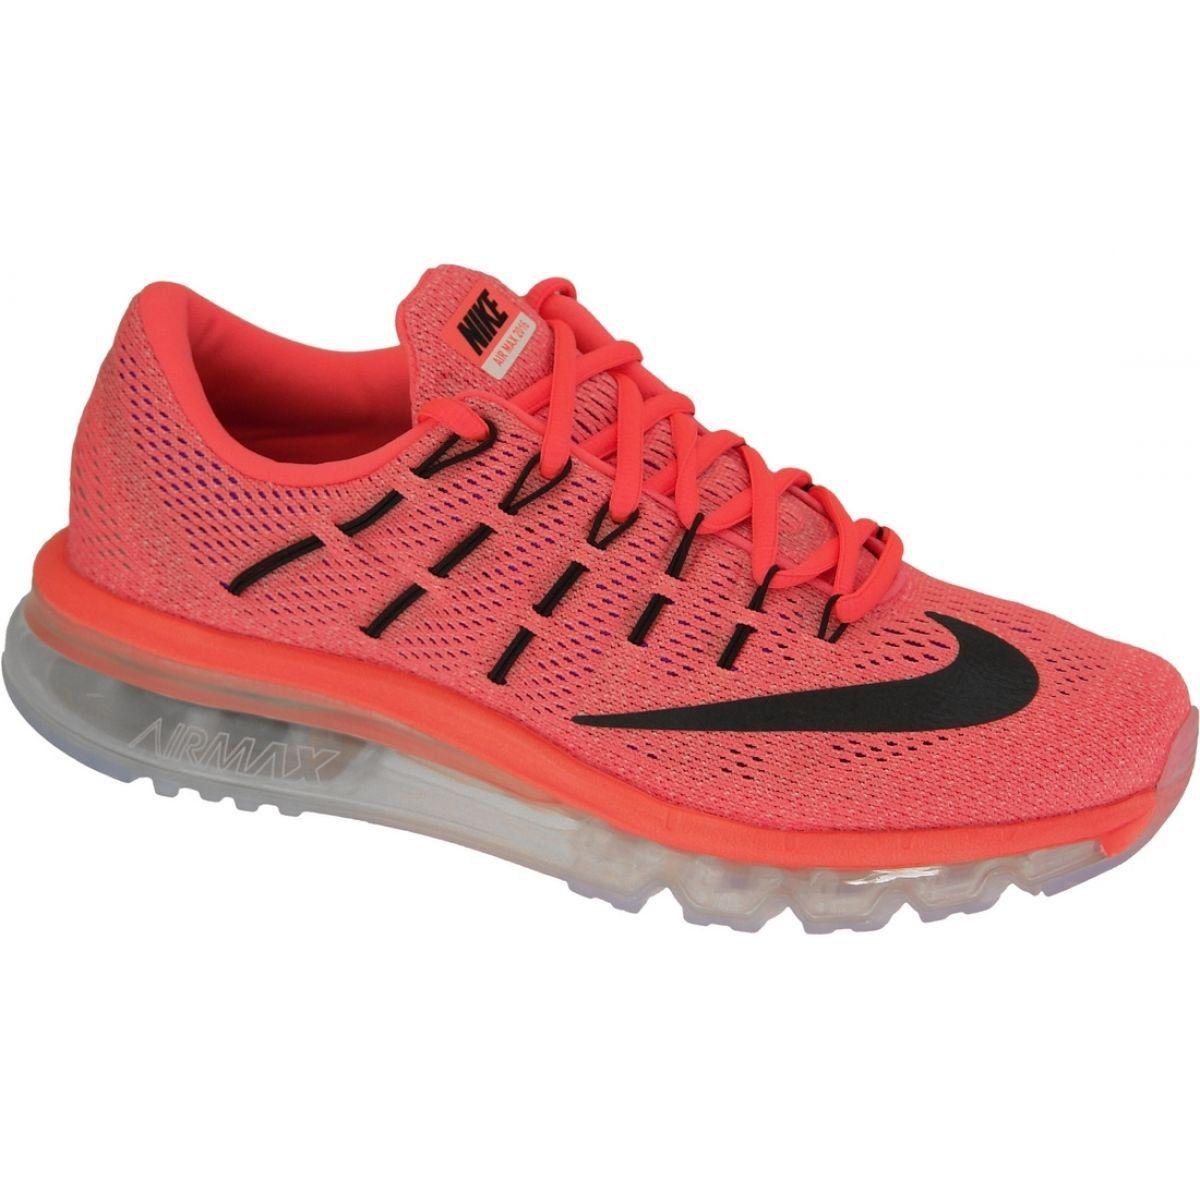 Buty Nike Air Max 2016 W 806772 800 Czerwone Nike Air Max 2016 Nike Air Max Nike Shoes Women